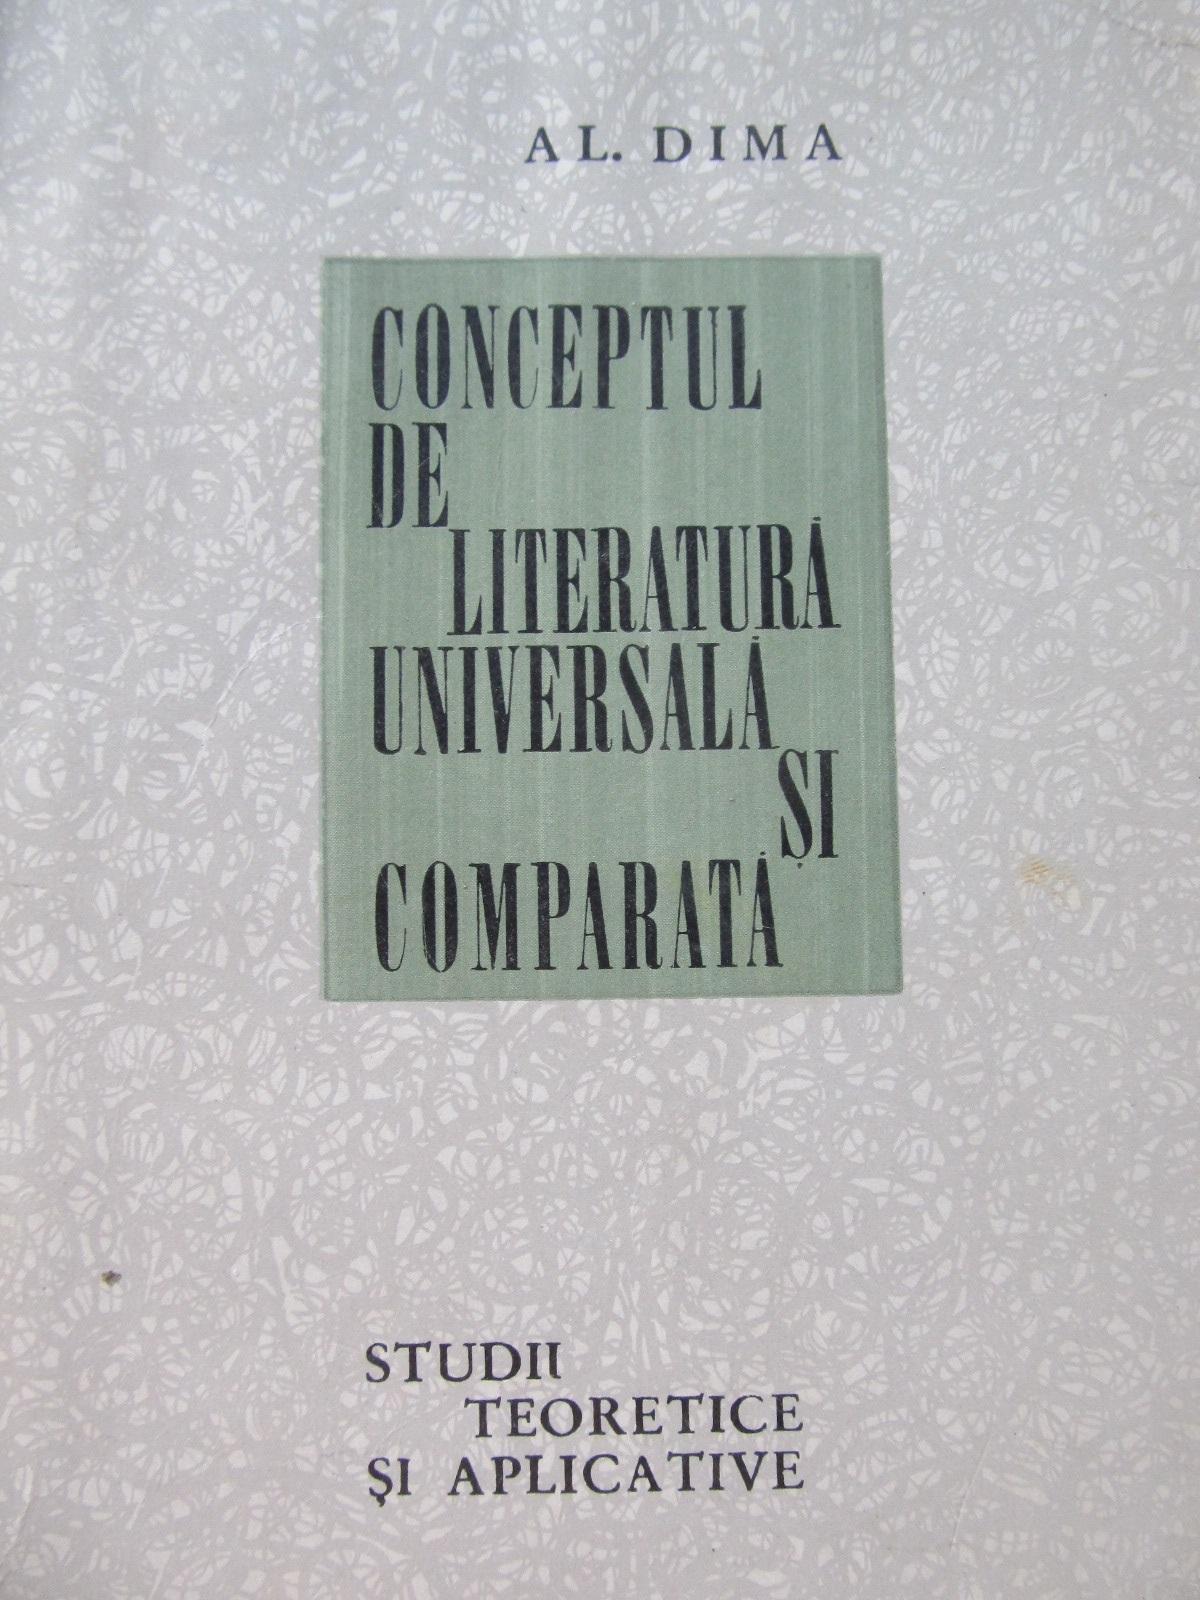 Conceptul de literatura universala si comparata - Al. Dima | Detalii carte